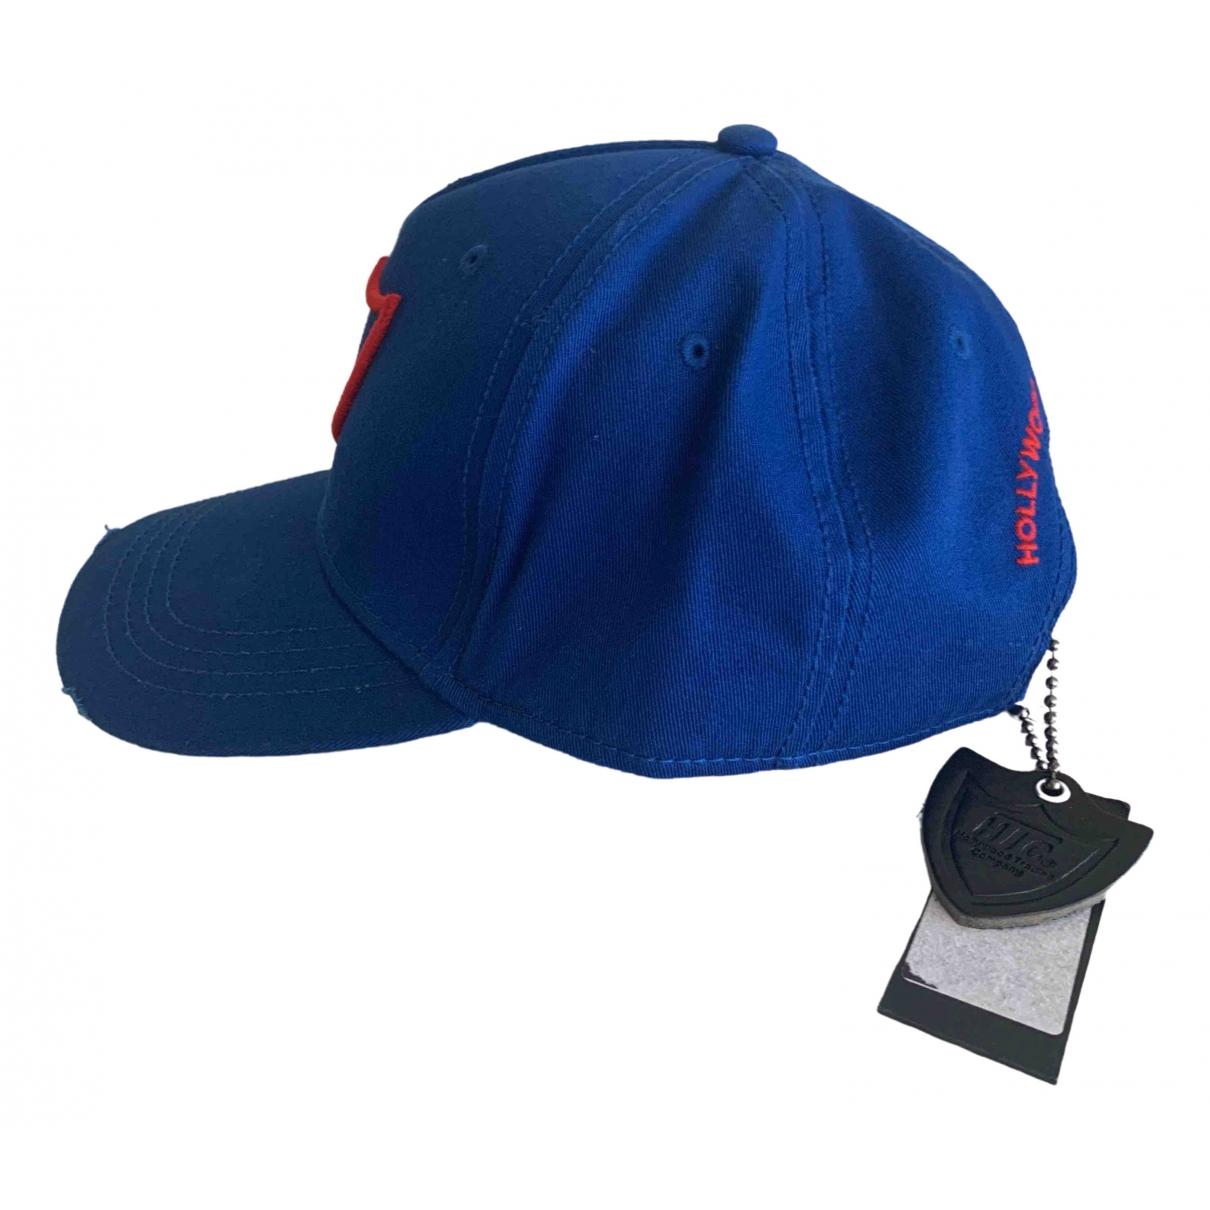 Sombrero / gorro Htc